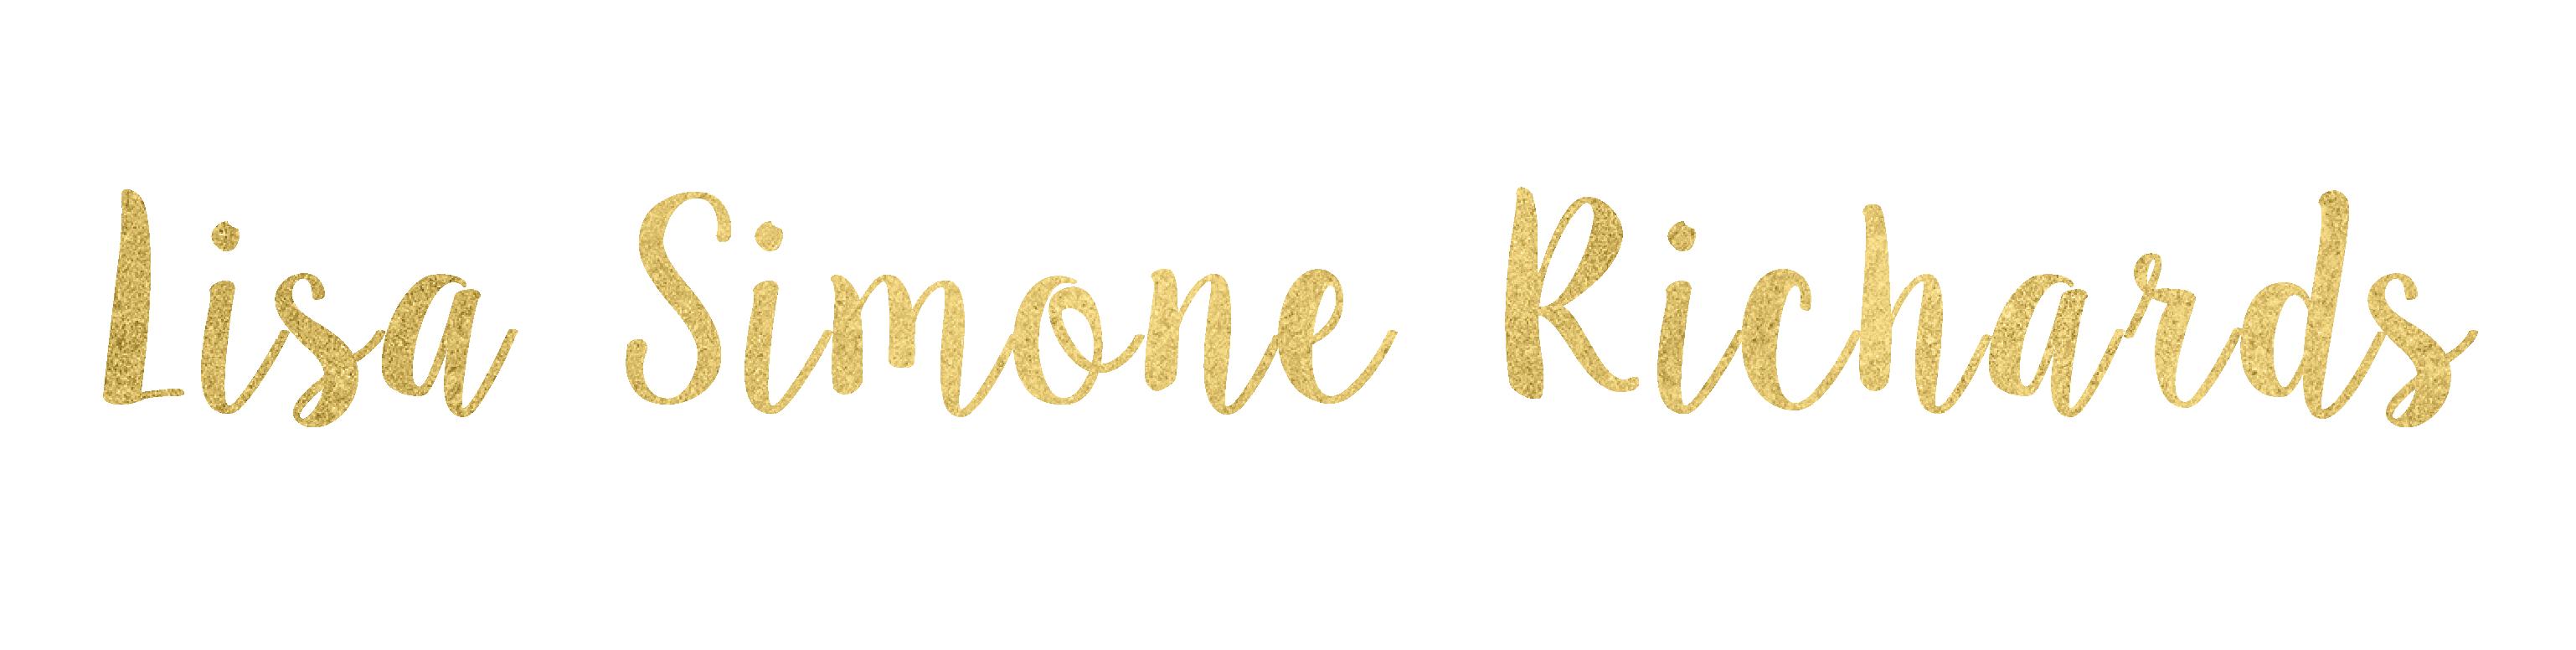 Lisa Simone Richards logo